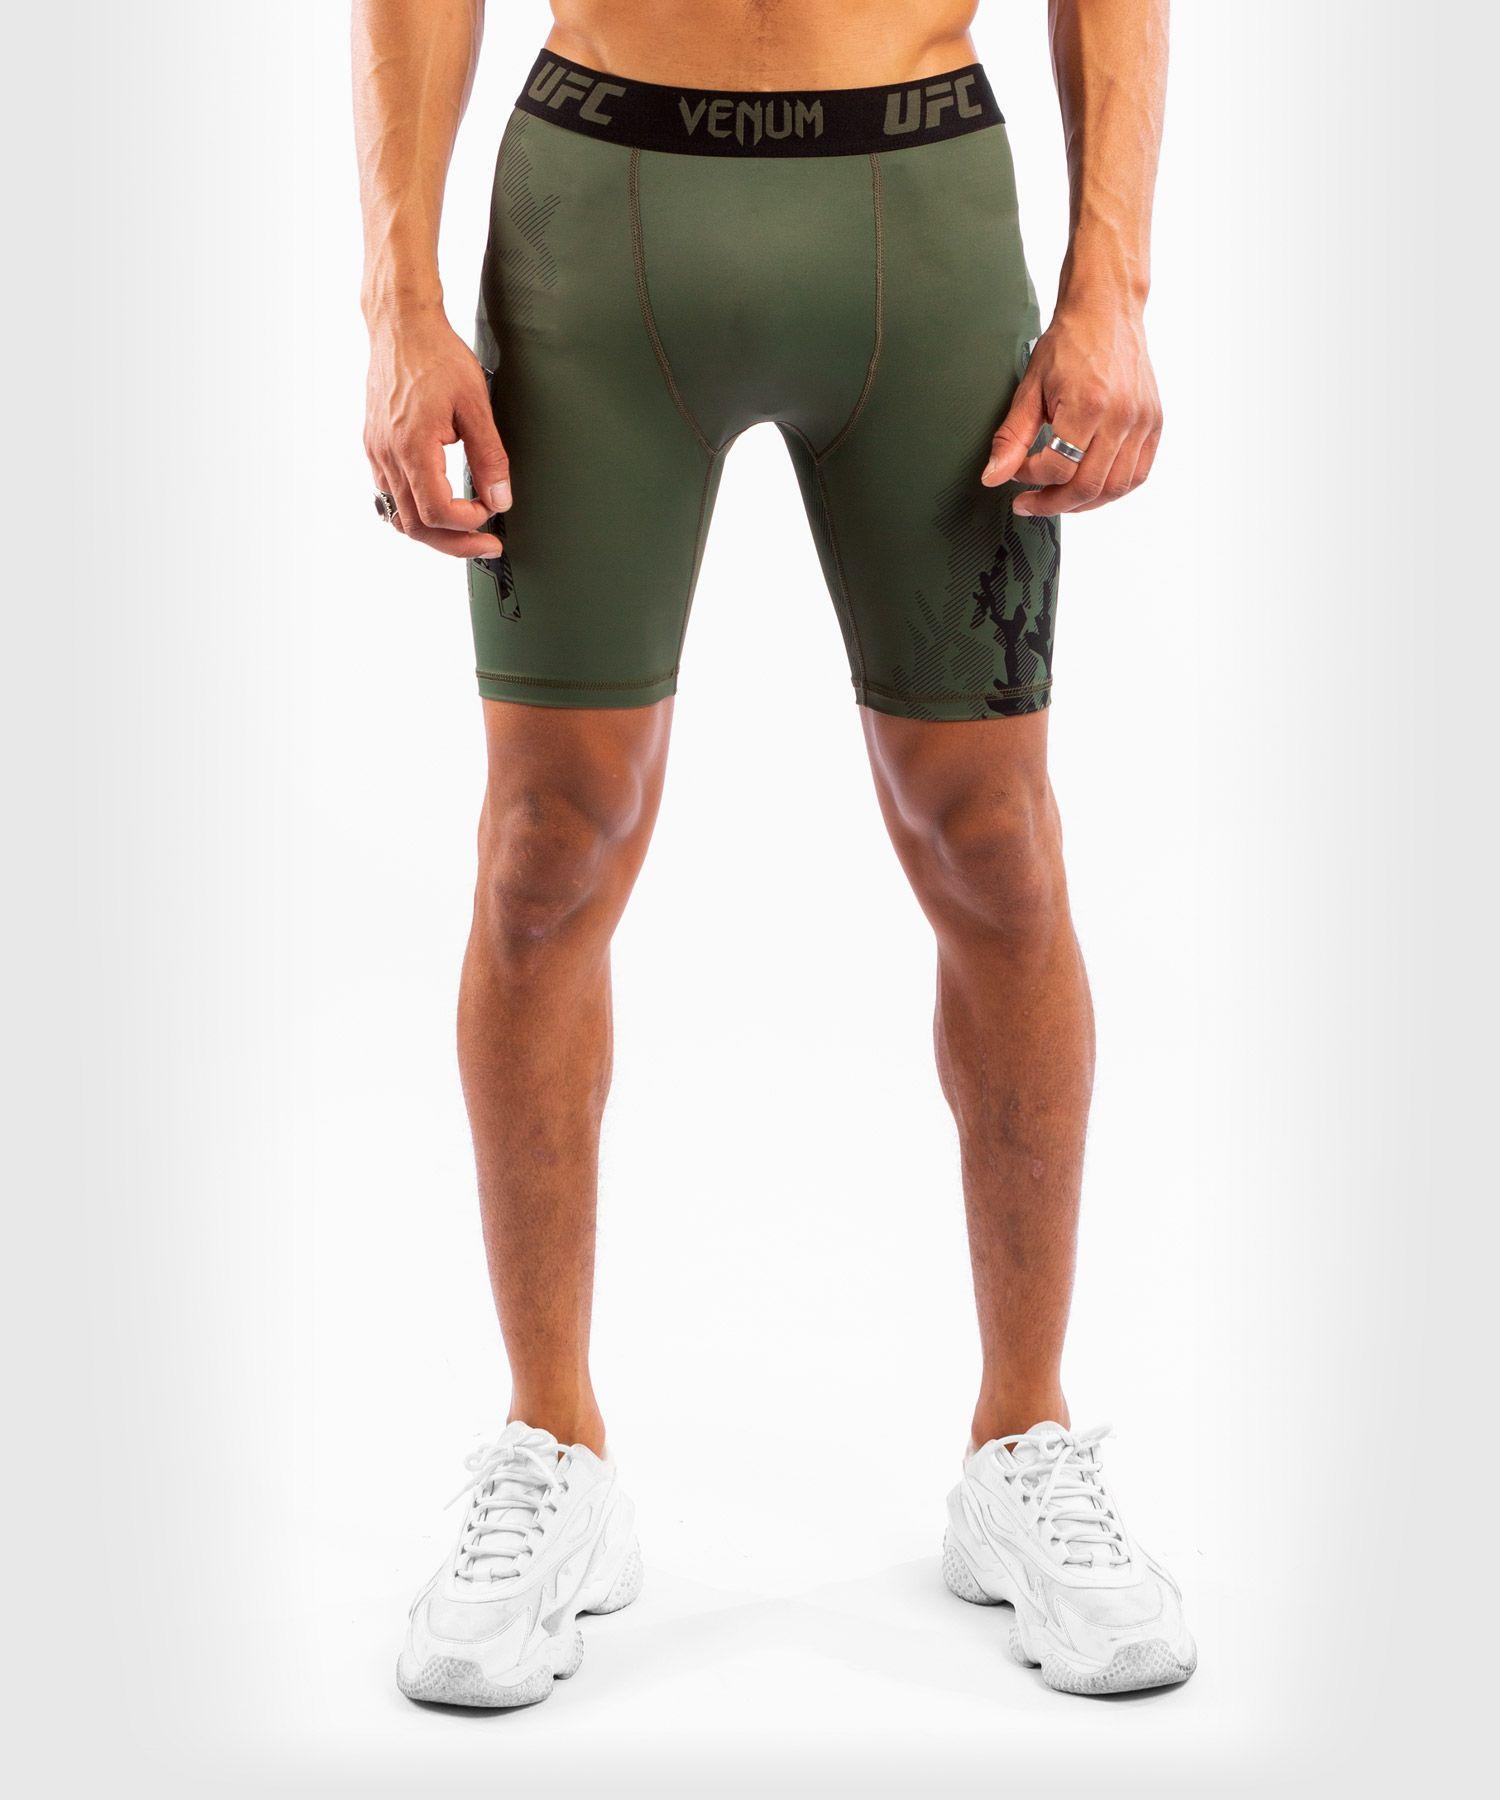 UFC Venum Authentic Fight Week Men's Performance Vale Tudo Shorts - Khaki